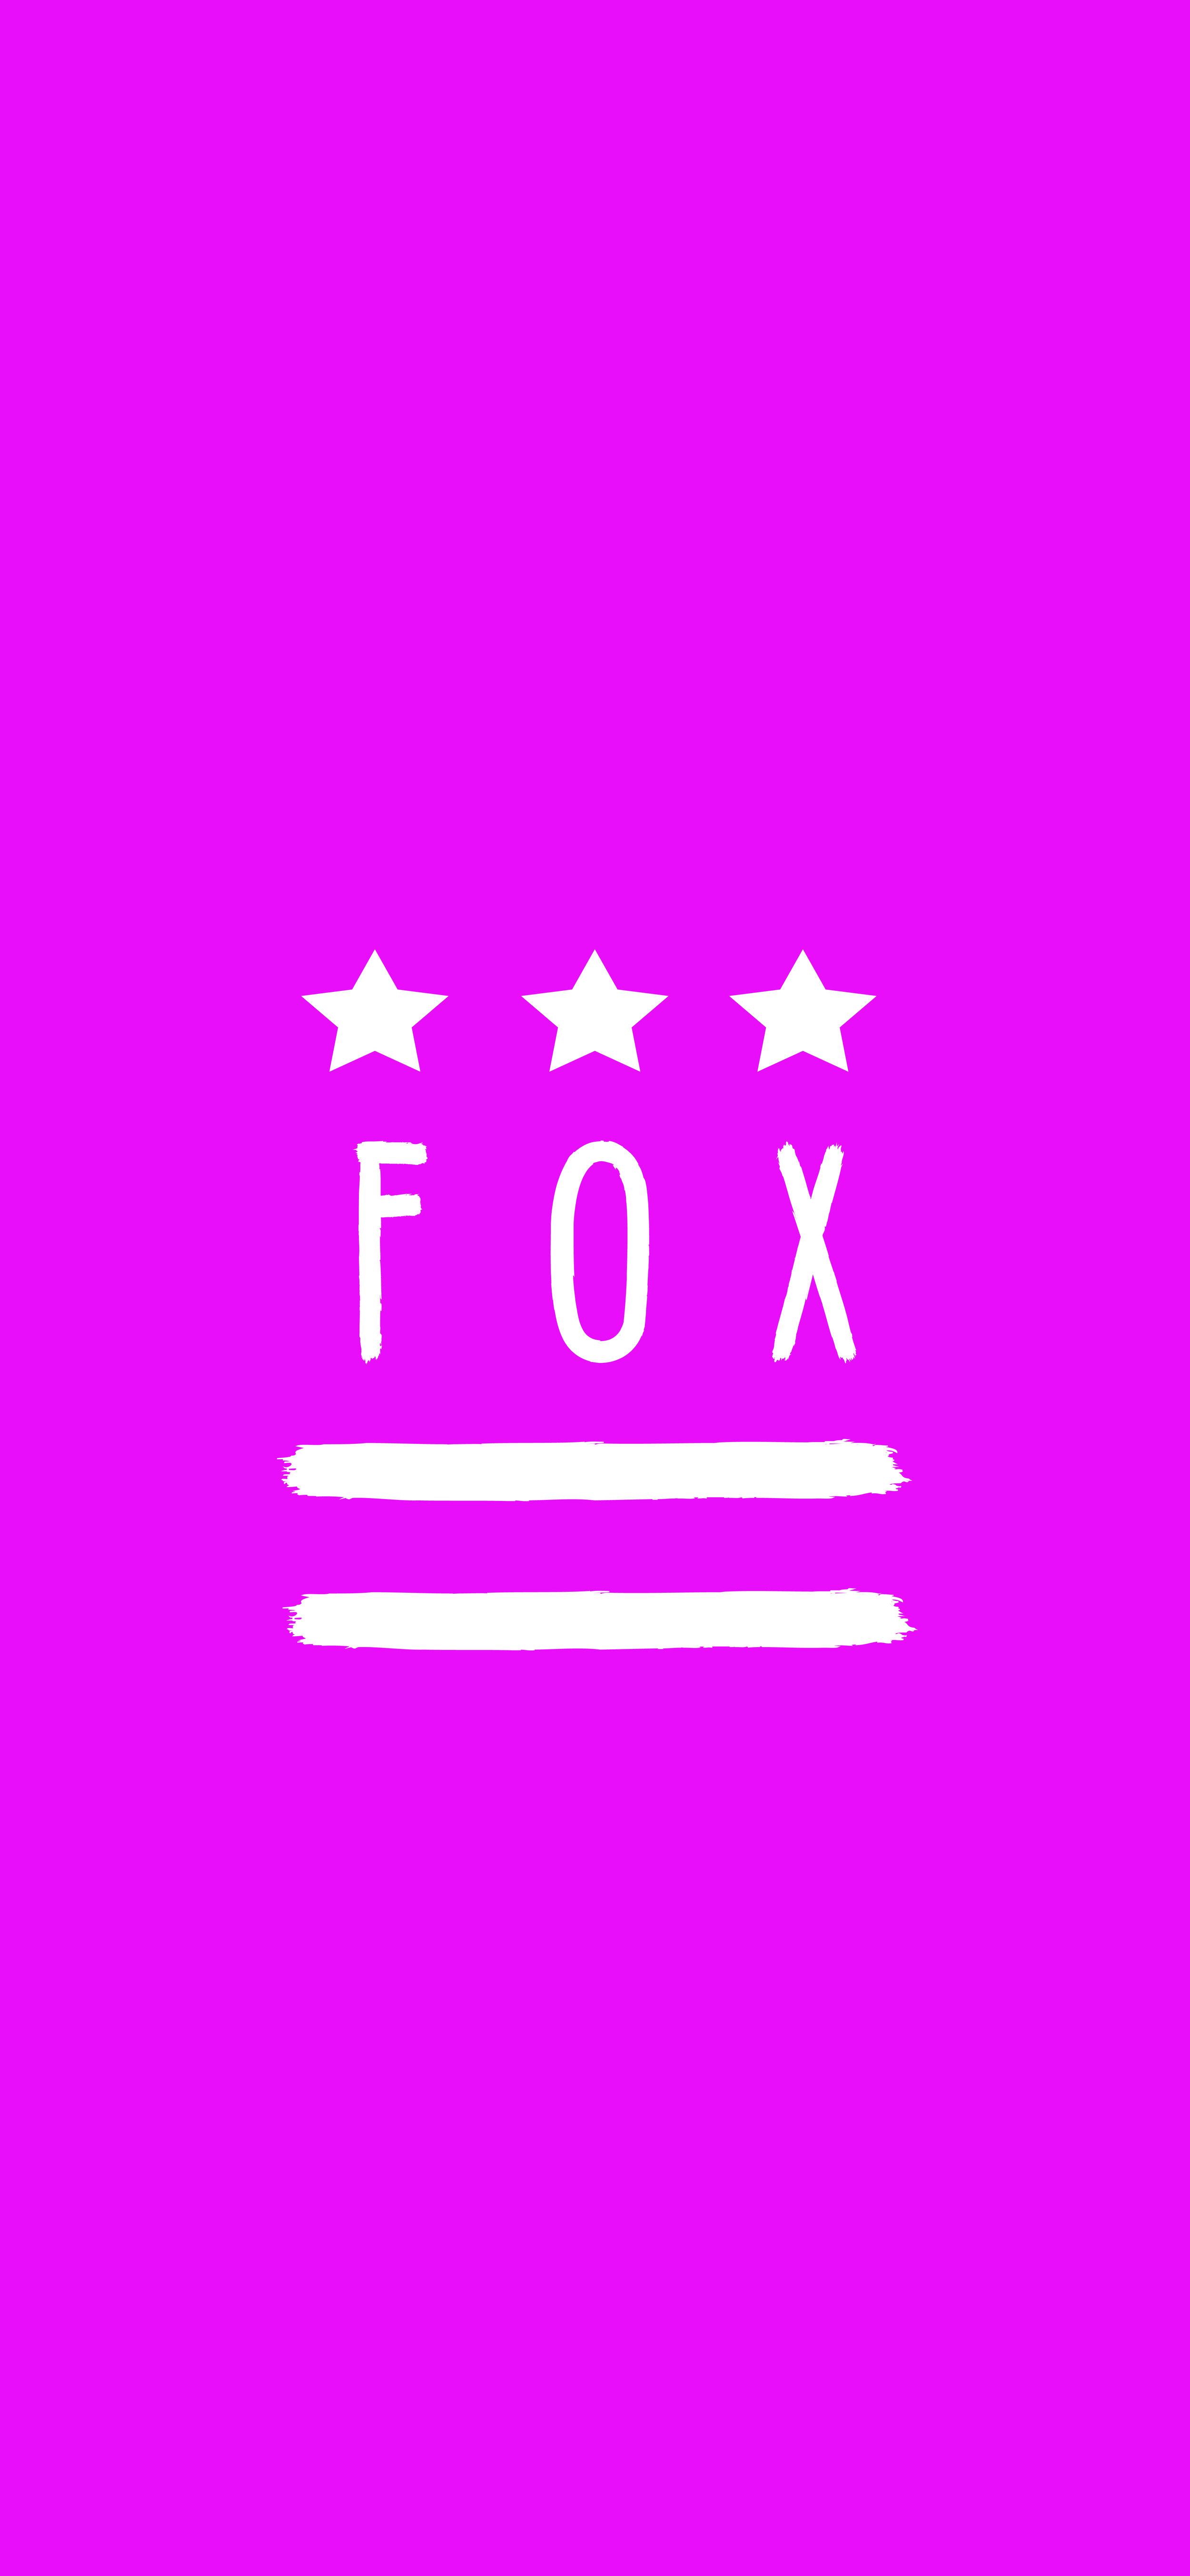 iPhone X BG - Stars Stripes Pink White.jpg